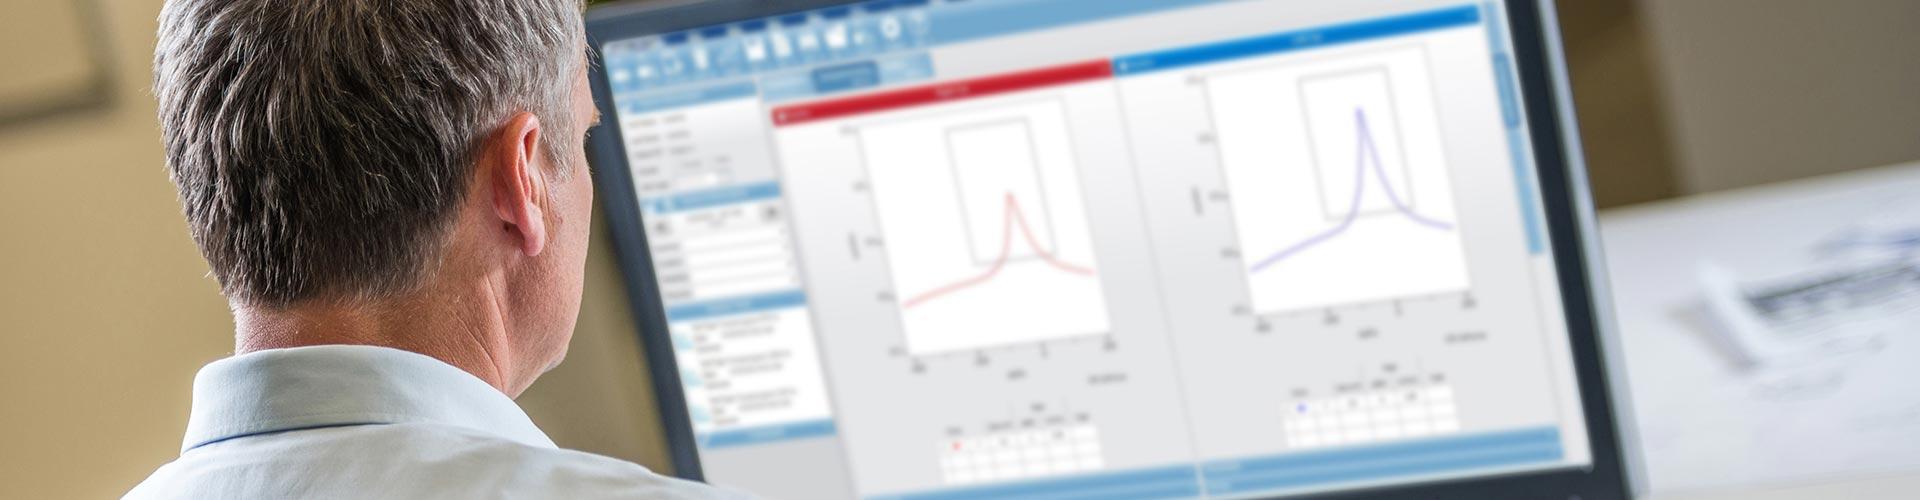 tympstar-pro-tympanometry-data-management